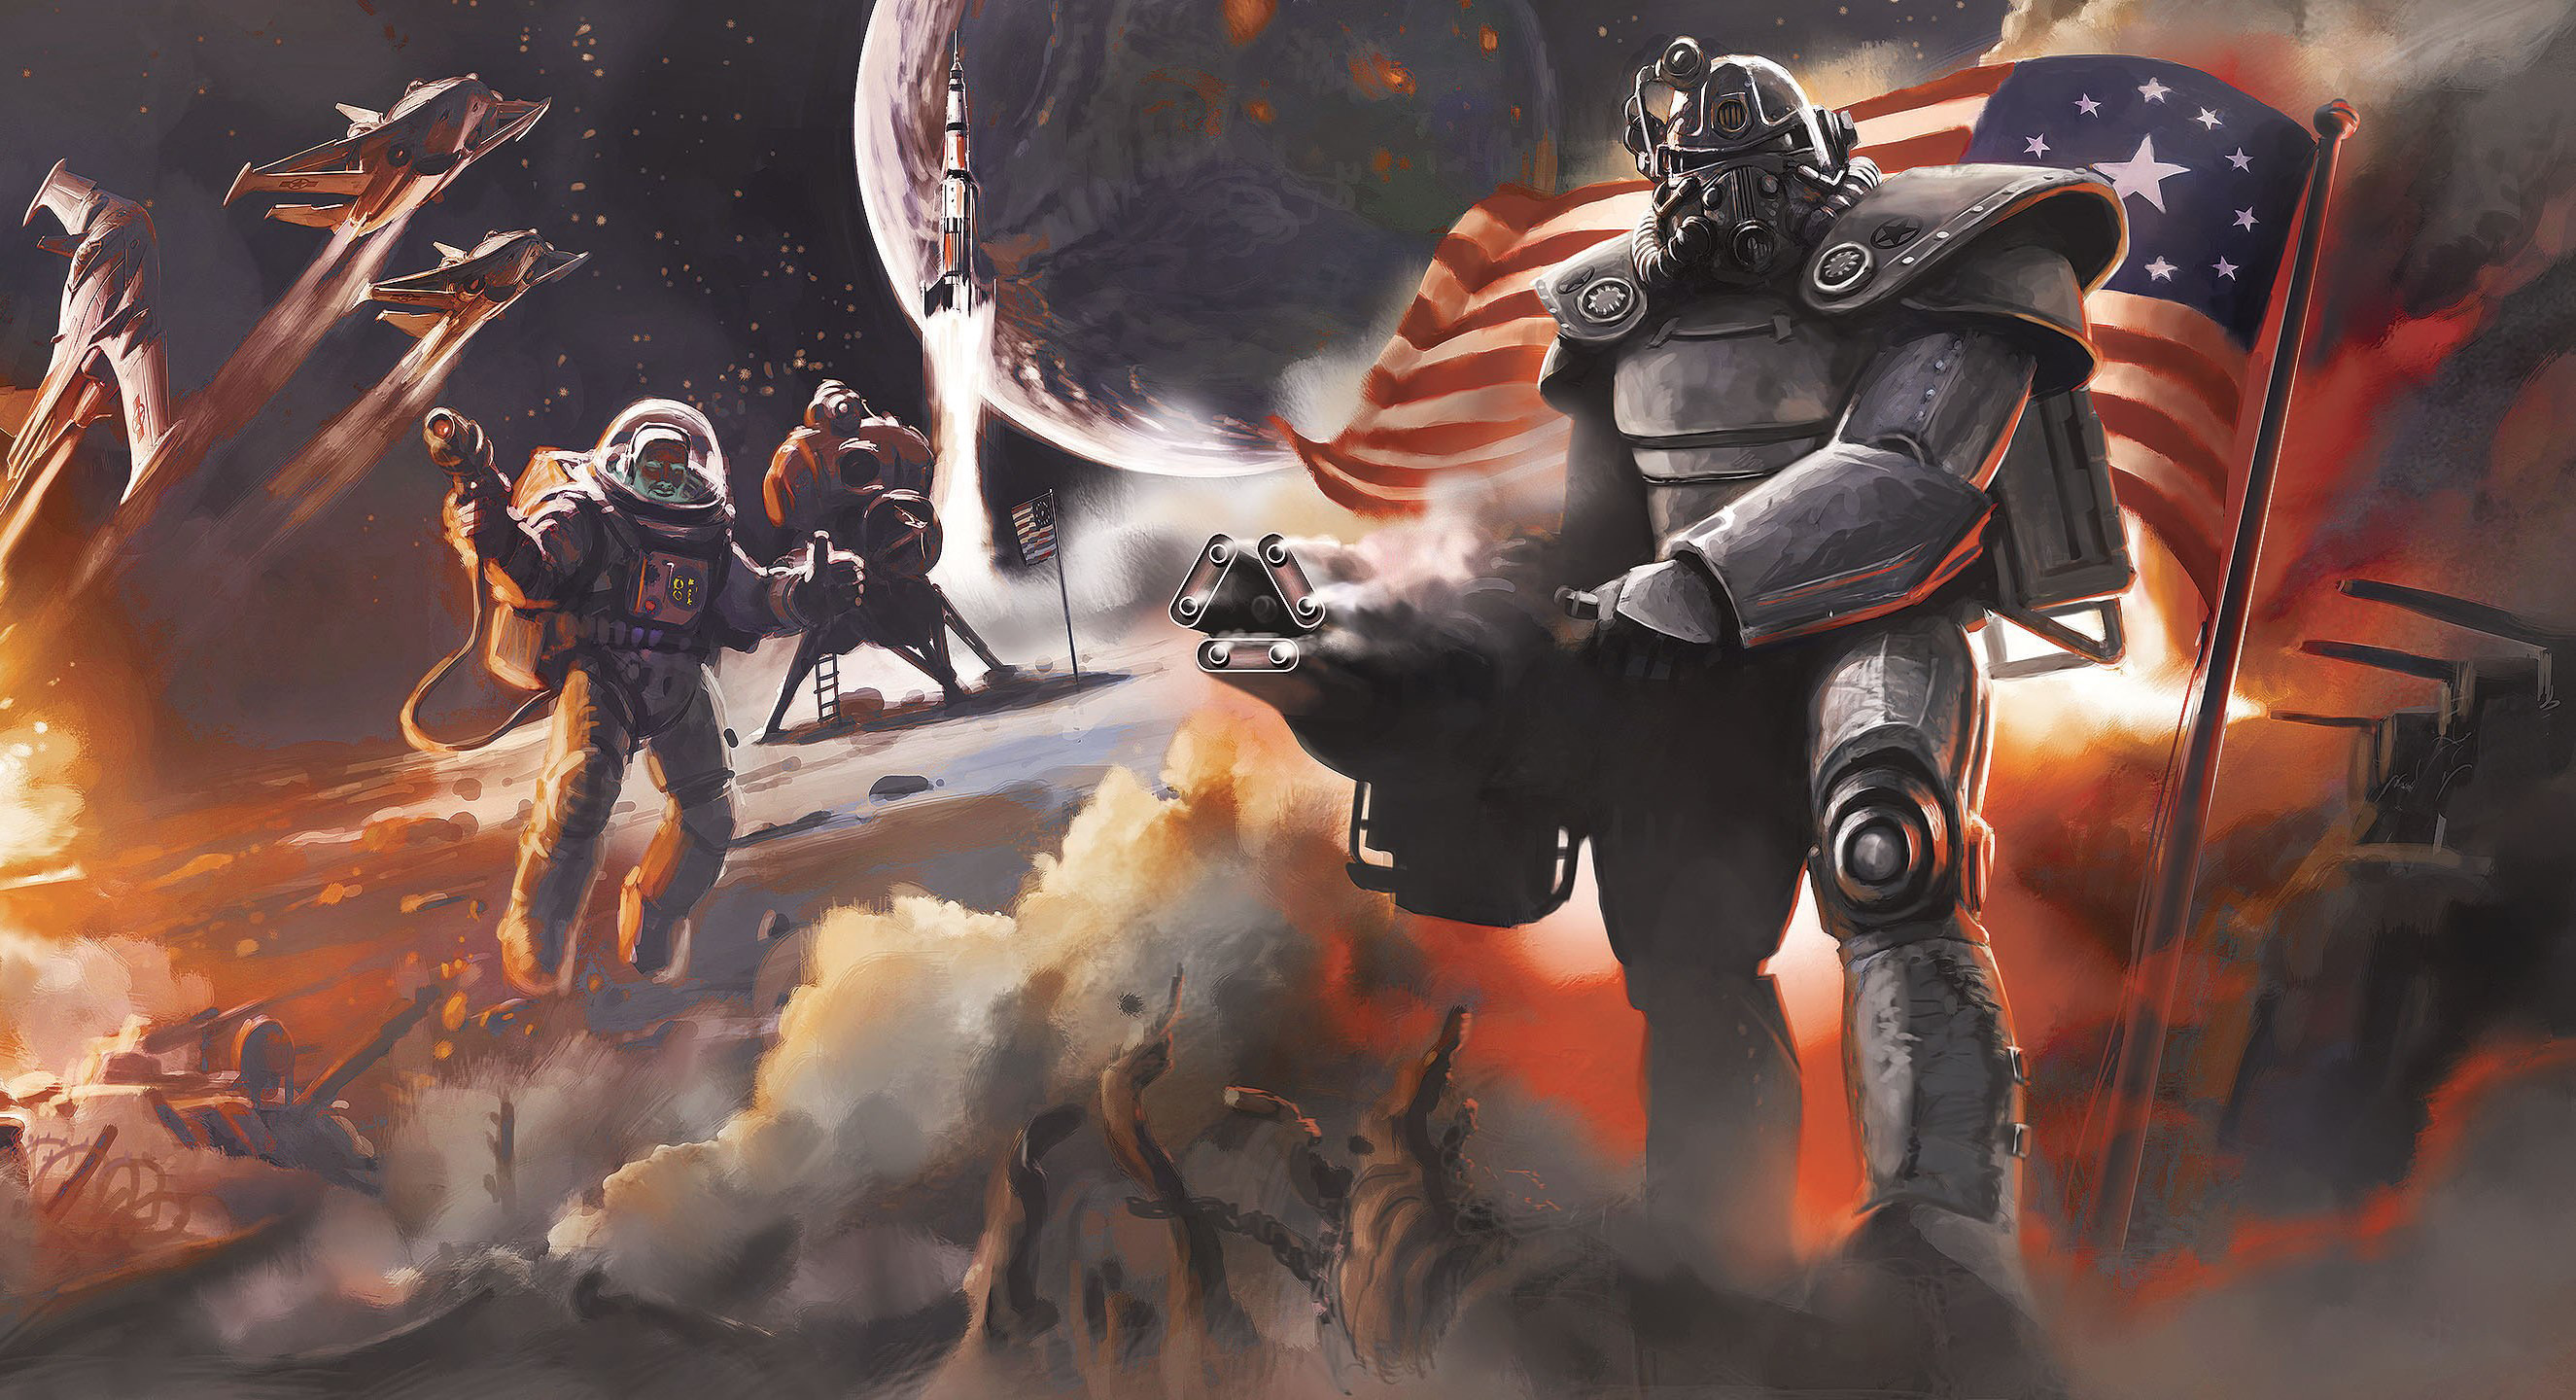 Fallout 4 Power Armor Wallpaper – WallpaperSafari